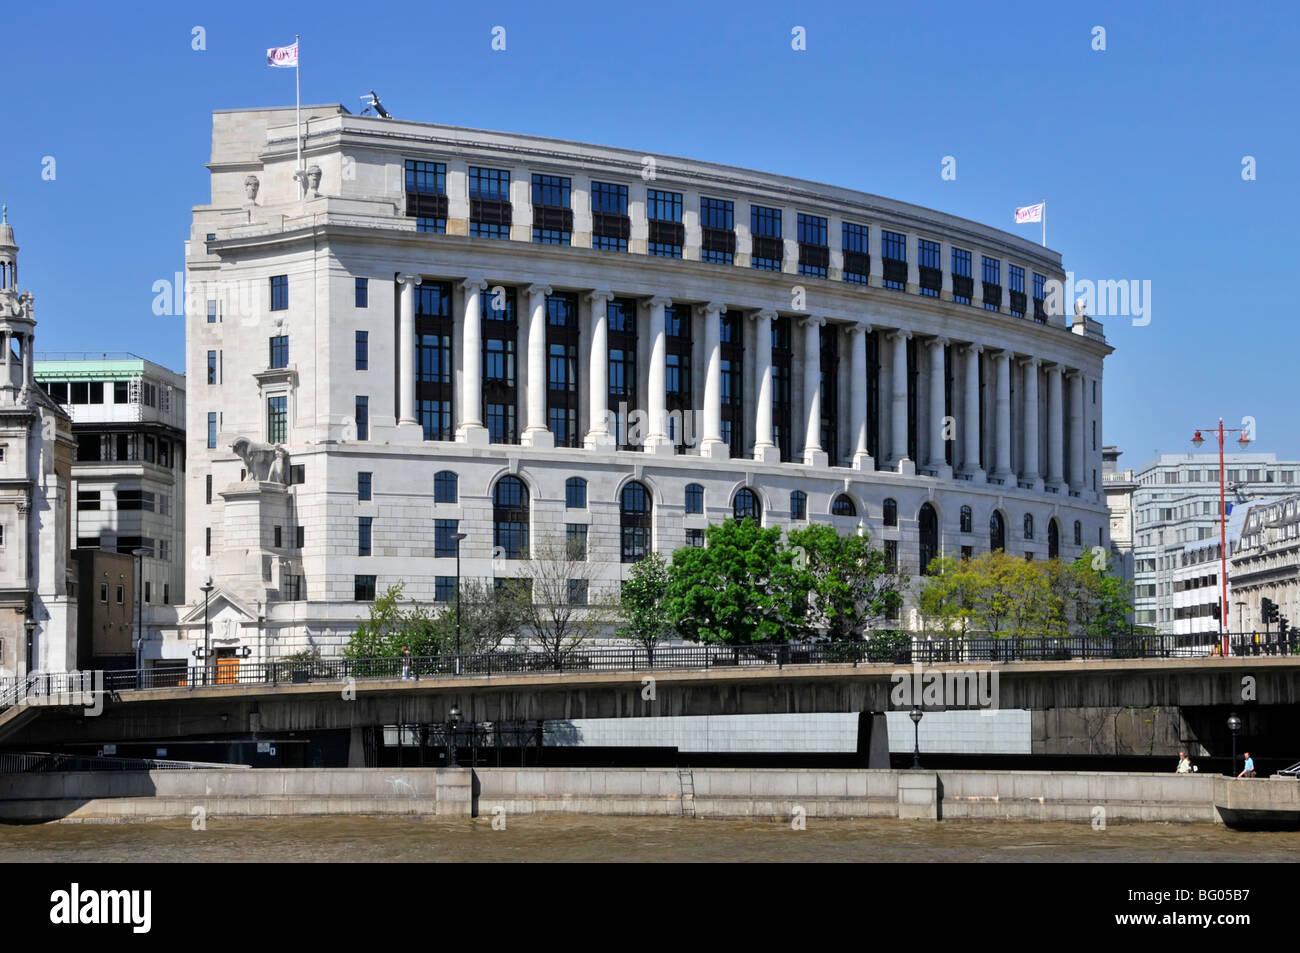 Unilever House headquarters building Blackfriars City of London England UK - Stock Image